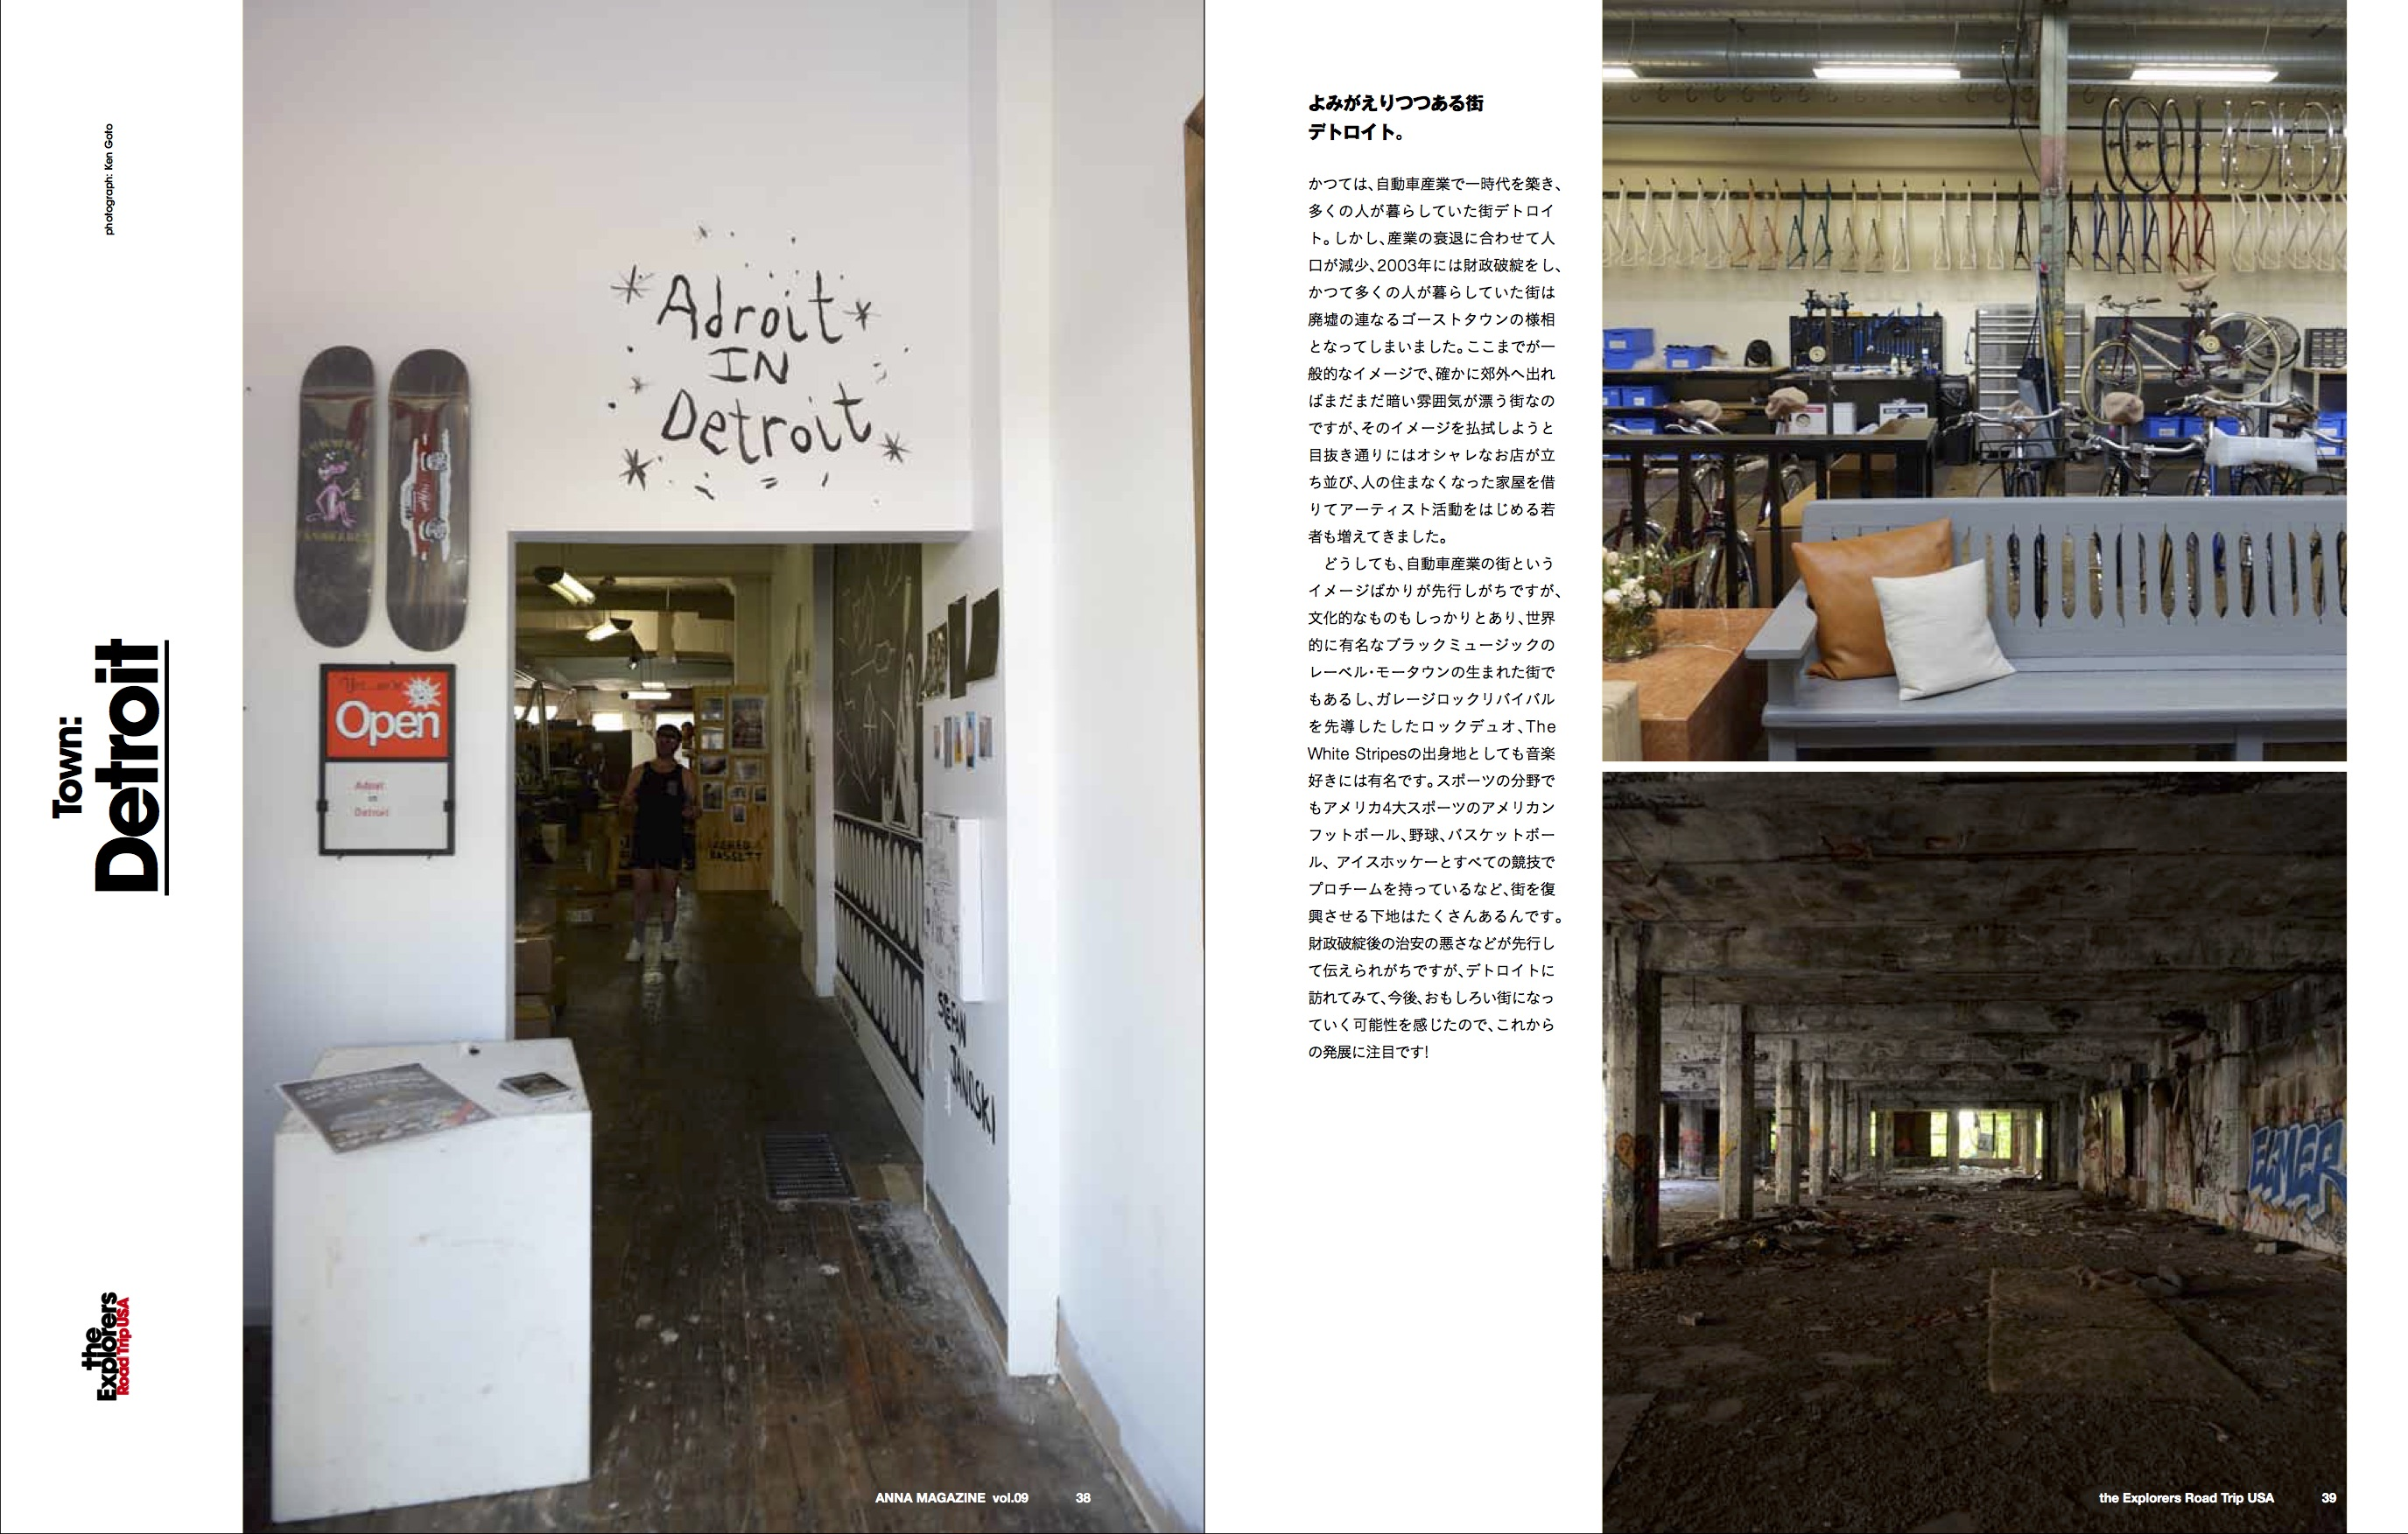 anna magazine vol.9 P18